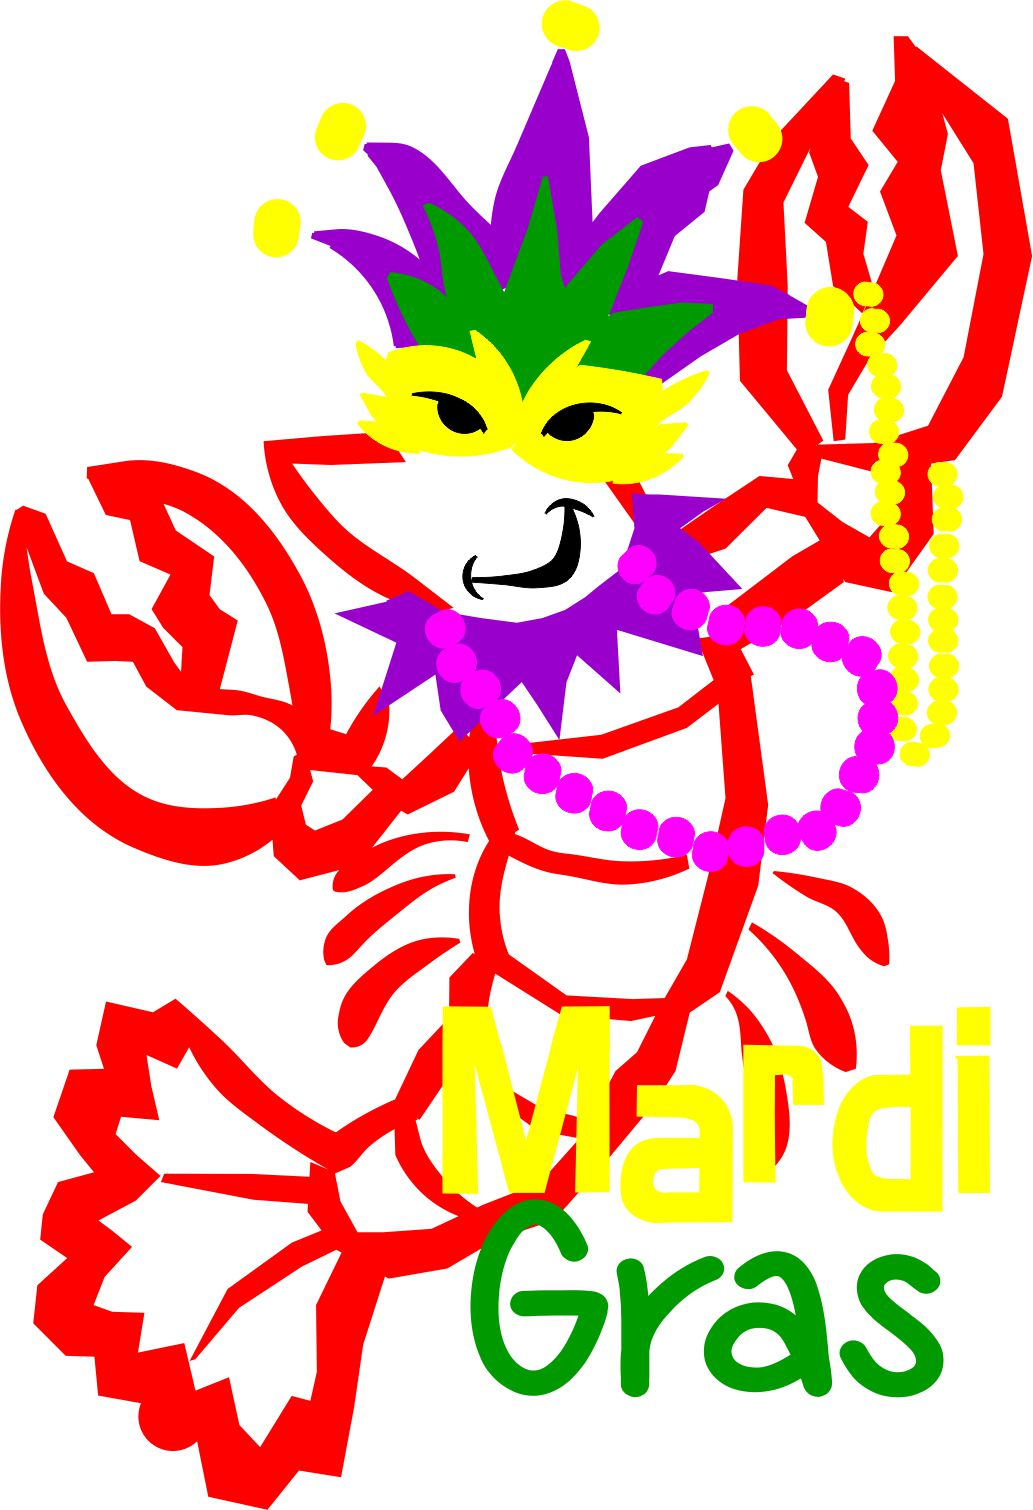 GGV 1076 Mardi Gras Crawfish SVG outline file.